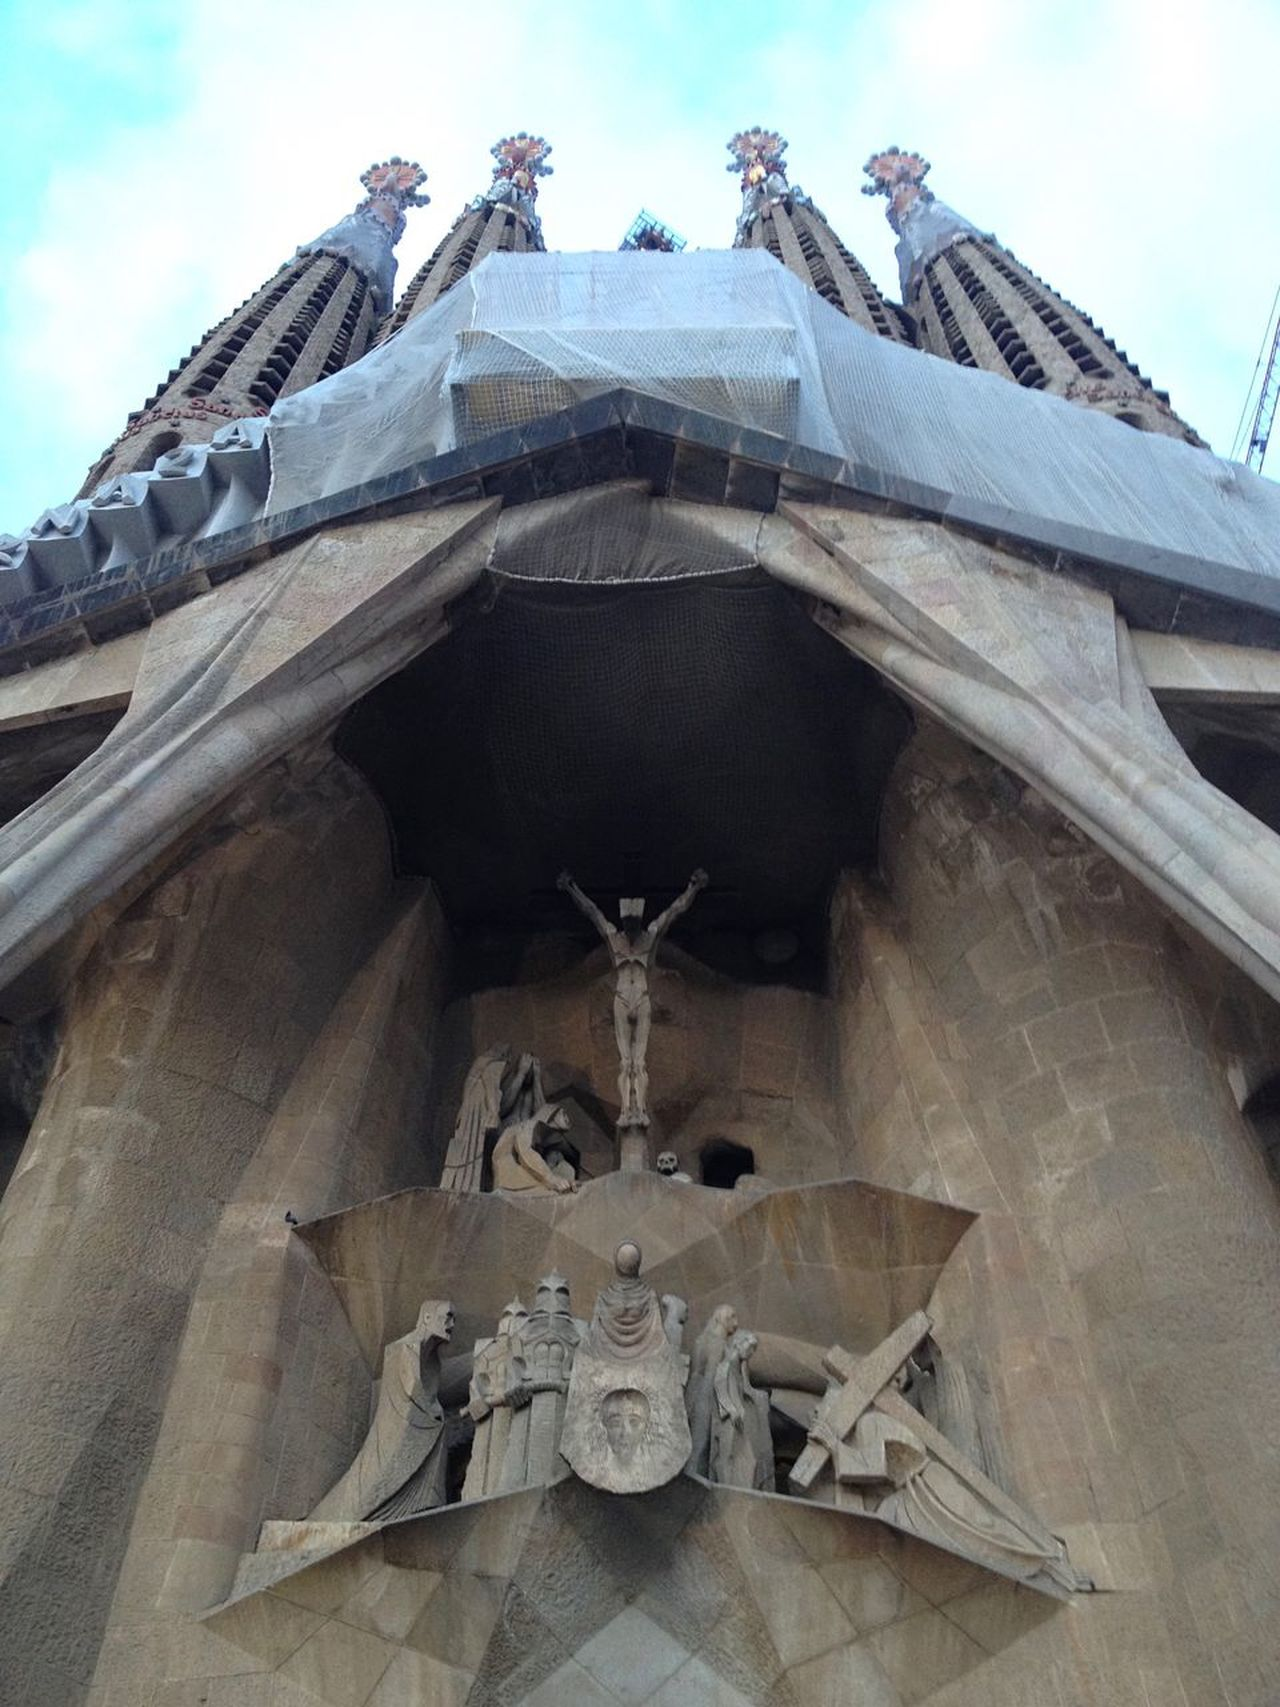 Sagrada Familia Gaudi Barcelona Religion Spirituality Architecture Built Structure Place Of Worship Low Angle View Building Exterior Cross Statue Sculpture No People Sky Outdoors Neighborhood Map The Architect - 2017 EyeEm Awards EyeEm Gallery EyeEm EyeEmNewHere